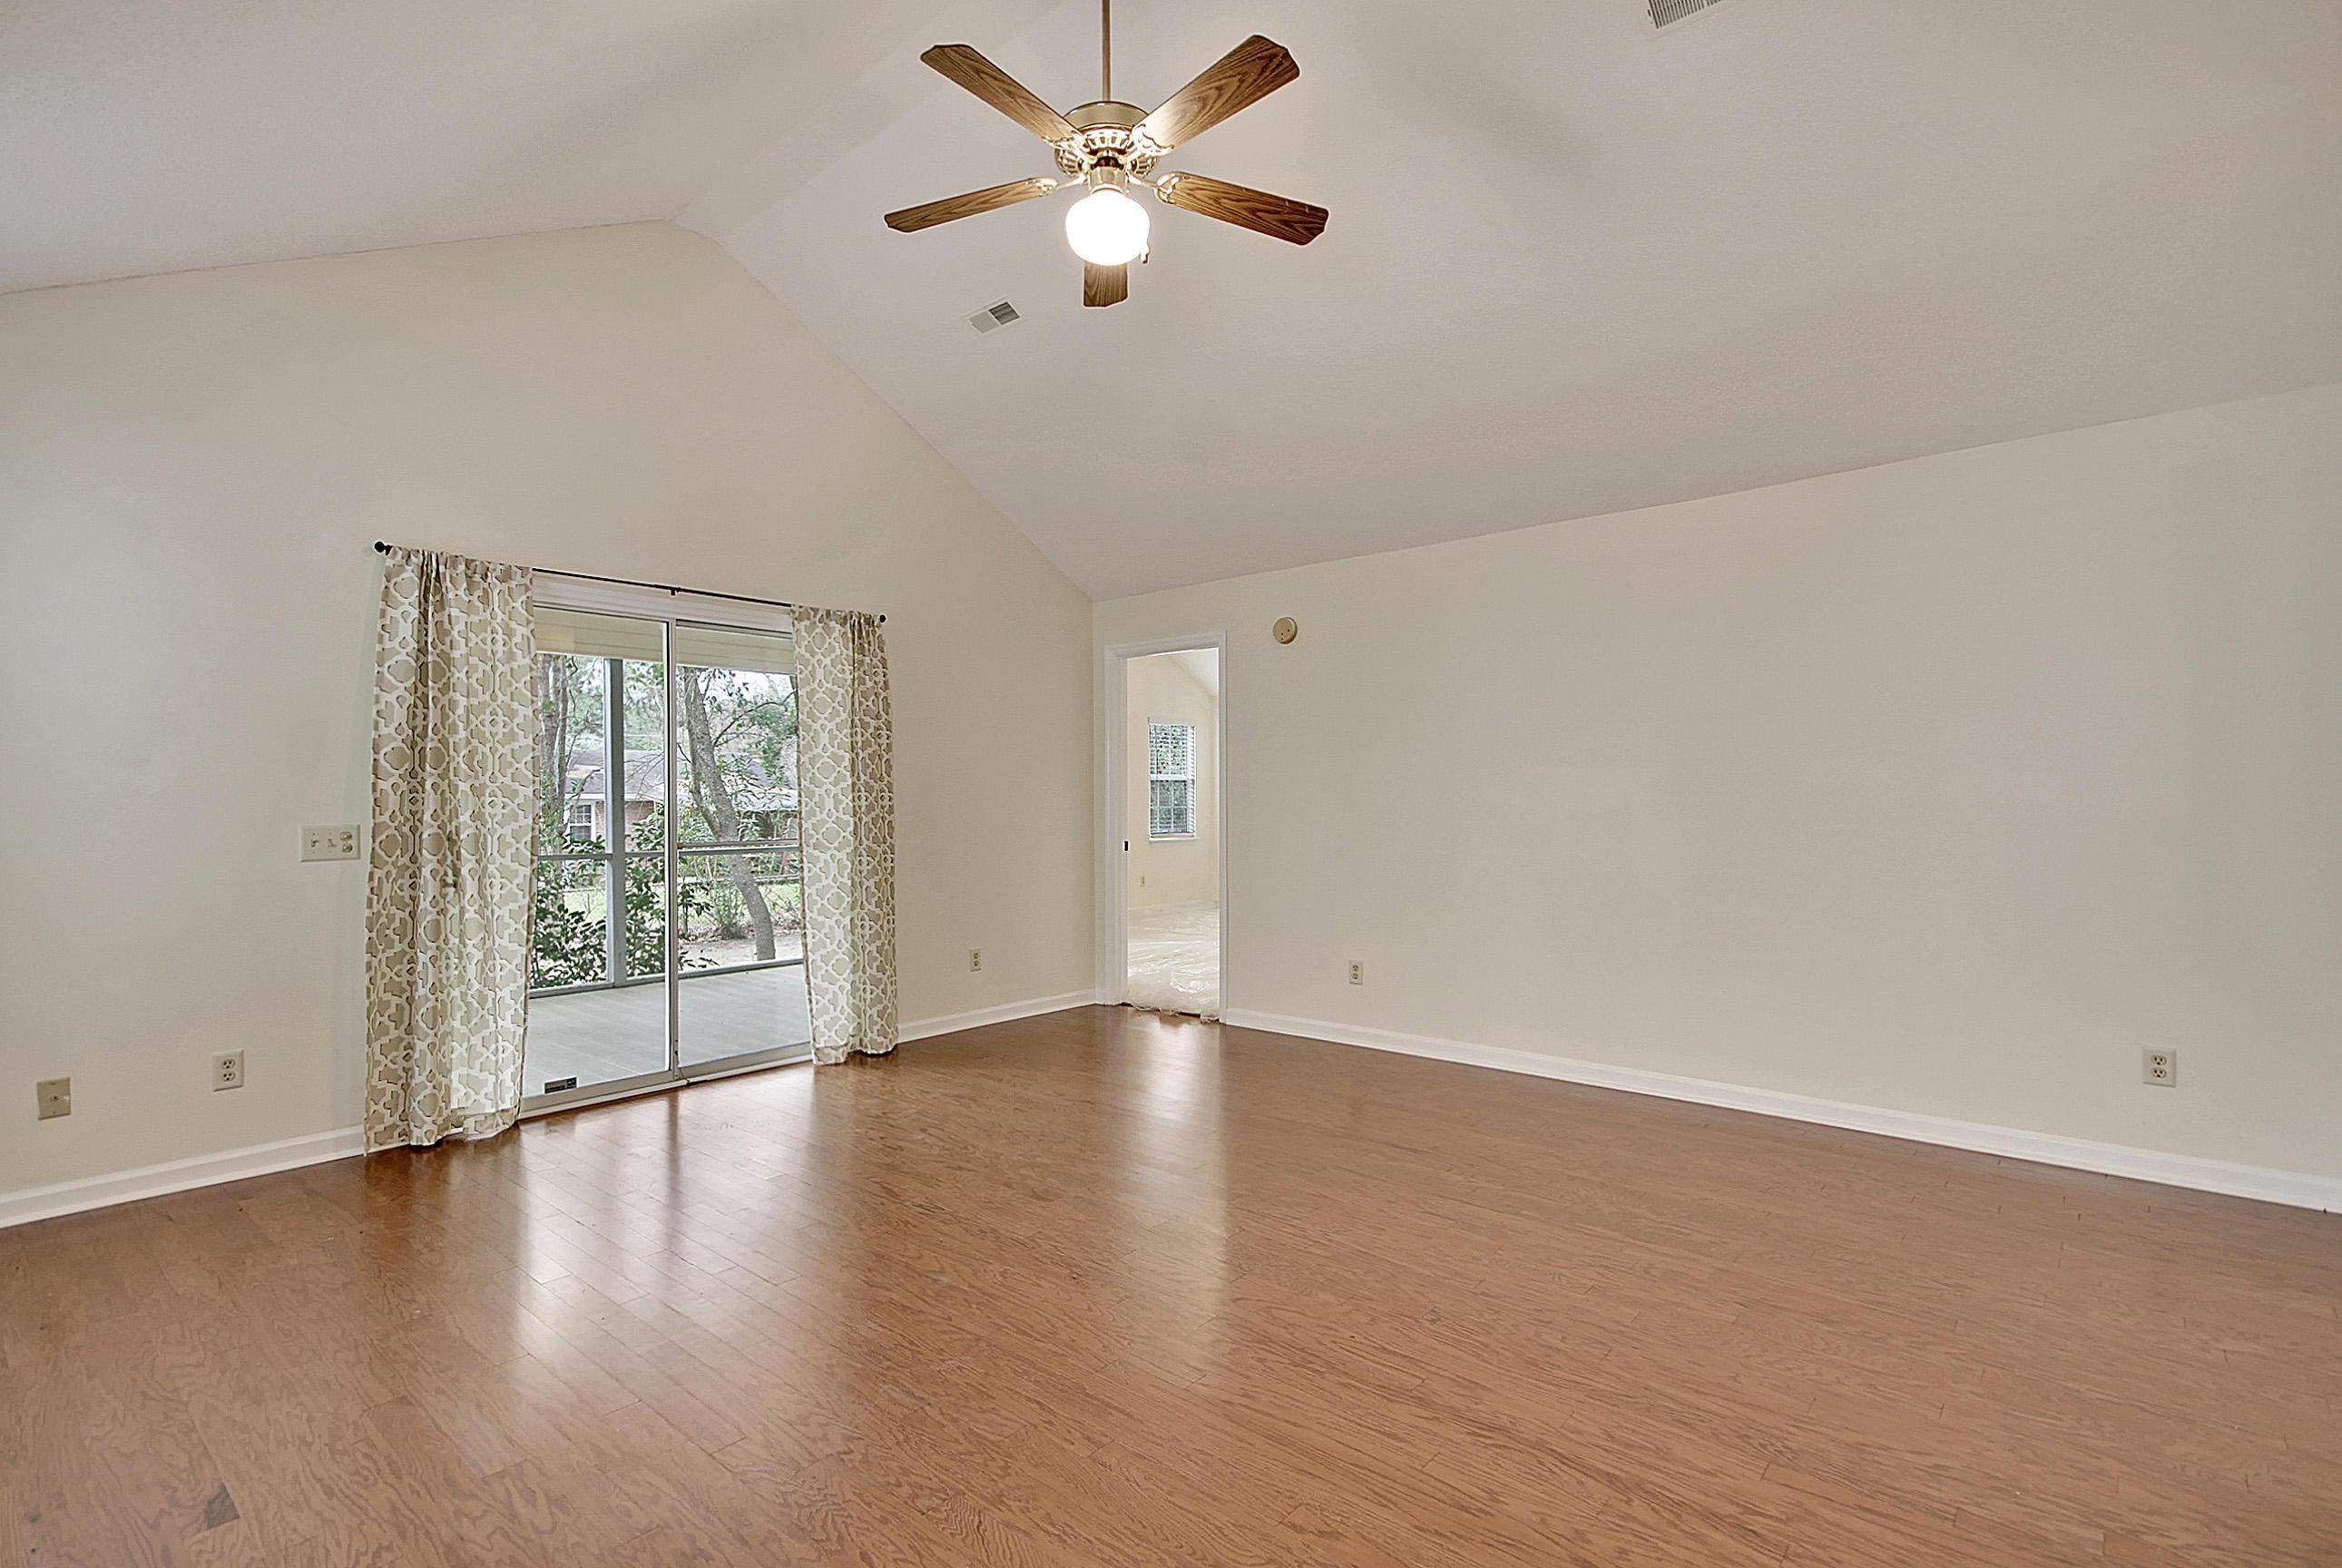 Harbor Place Homes For Sale - 845 Harbor Pl, Charleston, SC - 6